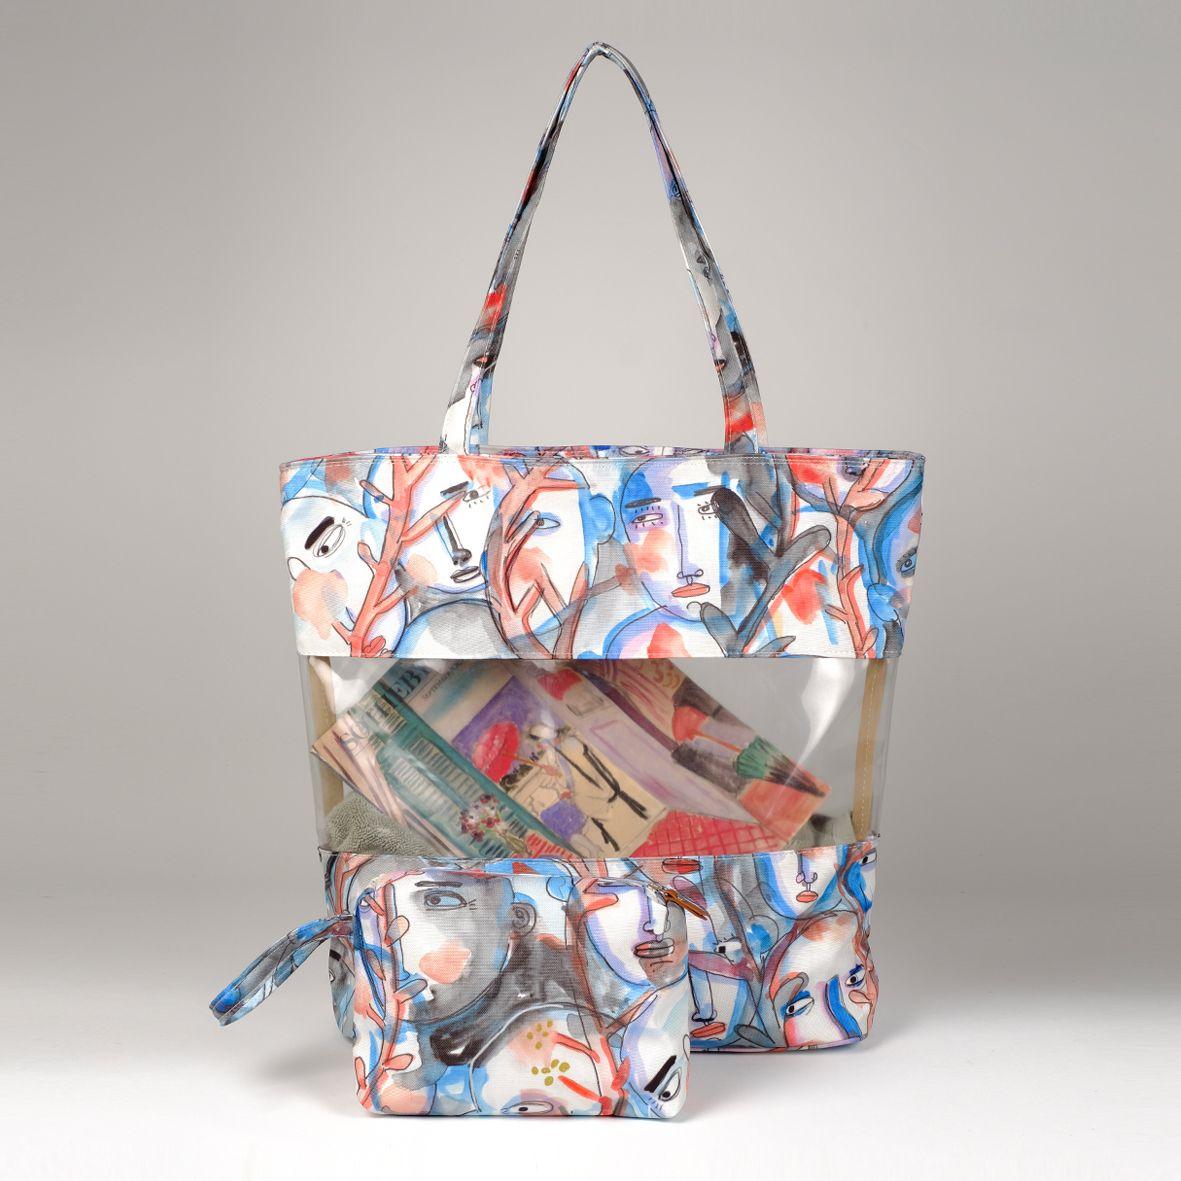 #beach #beachbag #beachtotebag #totebag #bagdesign #designersbag #summer #summertime